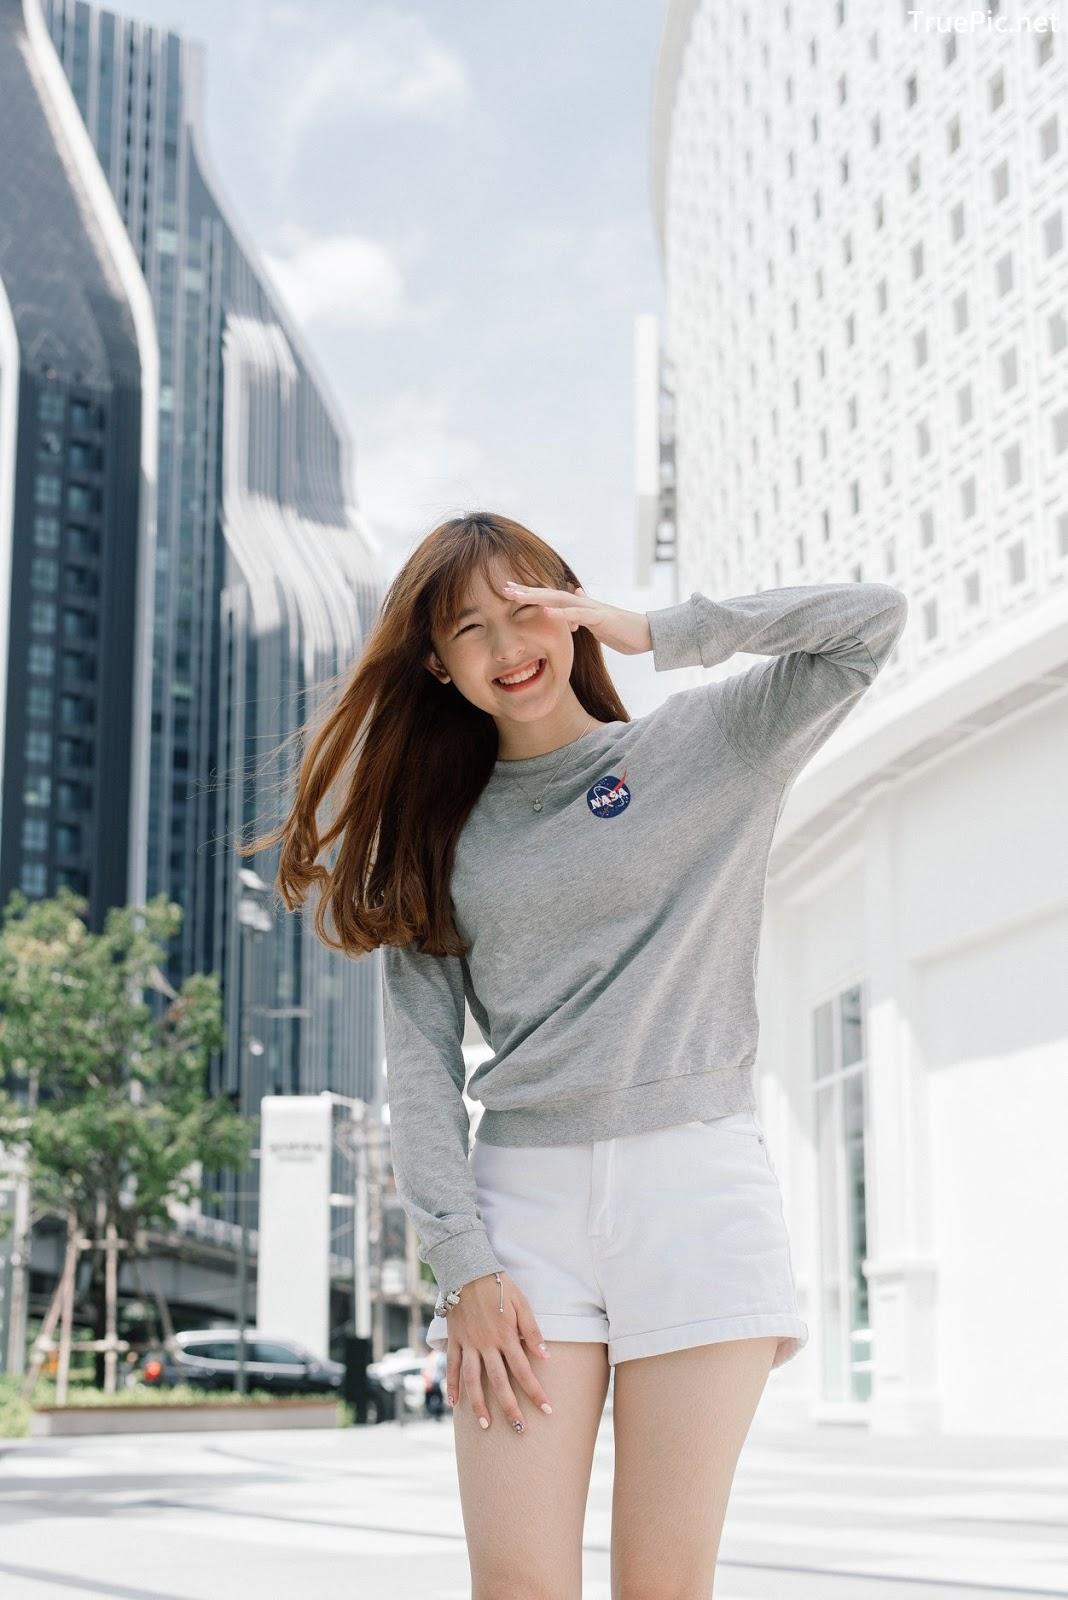 Image Thailand Cute Model – Emma Panisara - Nasa Mitrtown - TruePic.net - Picture-8